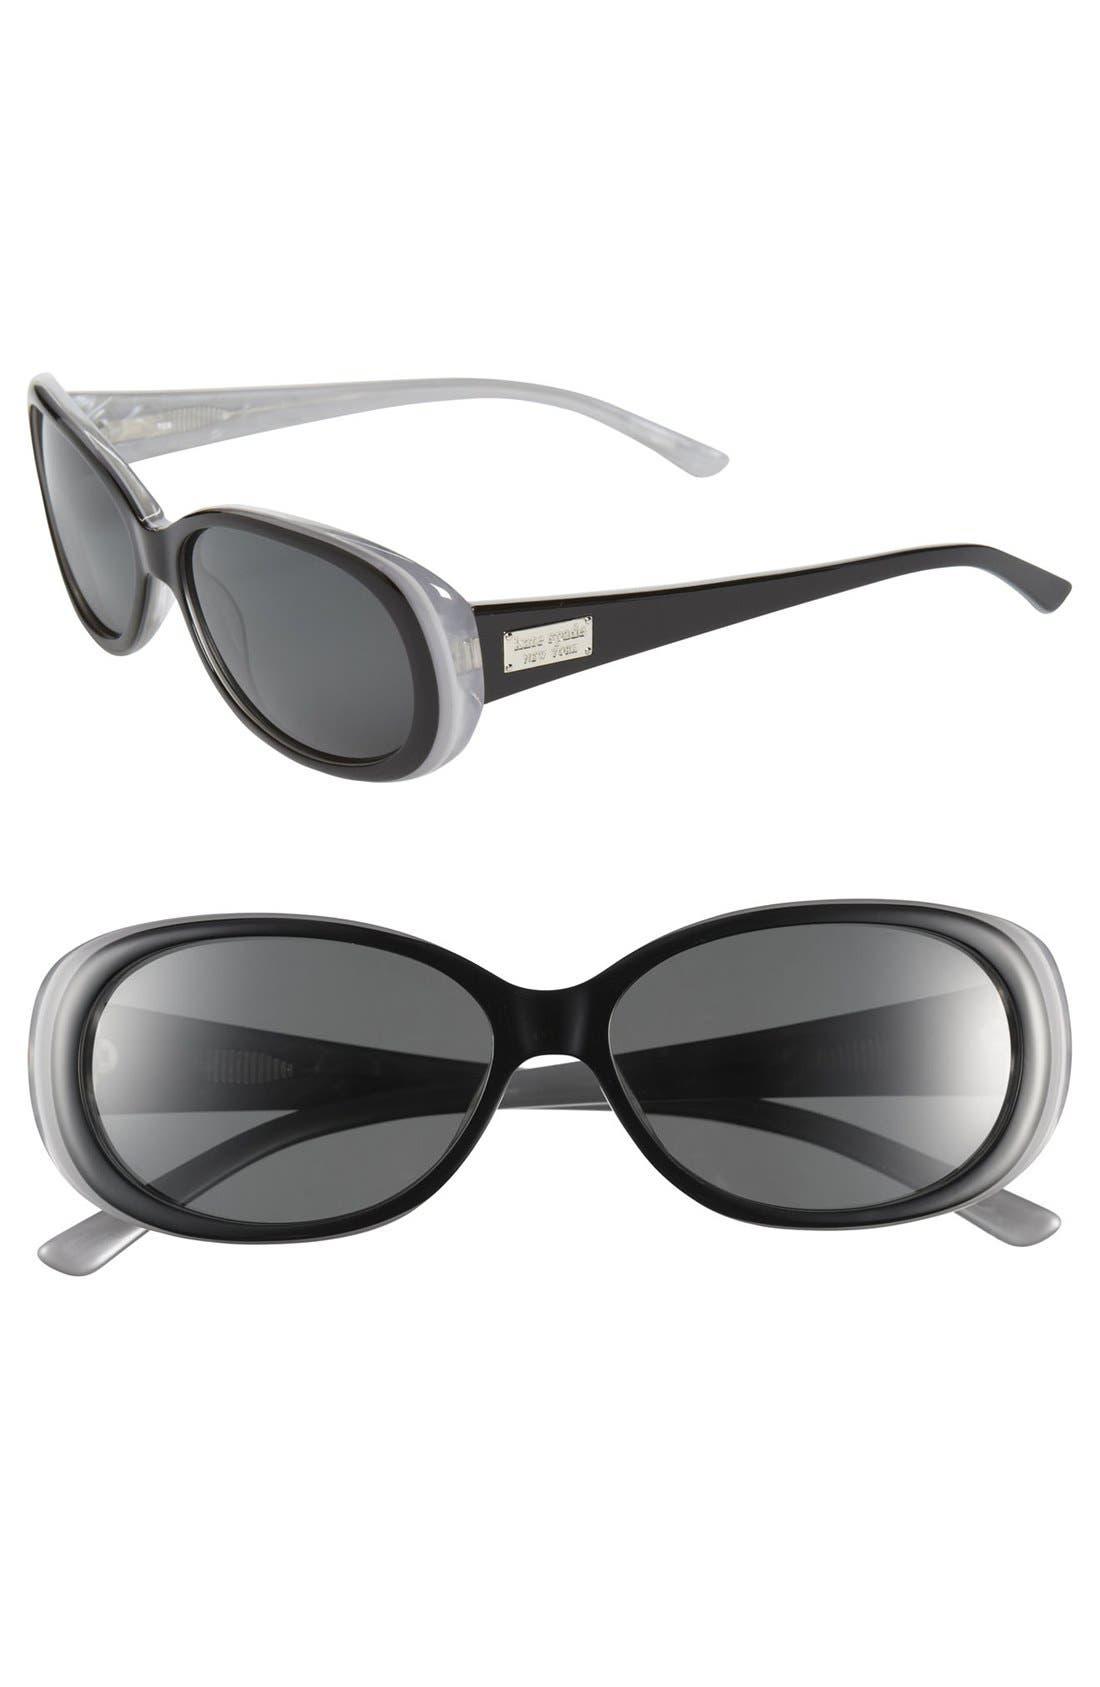 Main Image - kate spade new york 'sinclair' 55mm polarized sunglasses